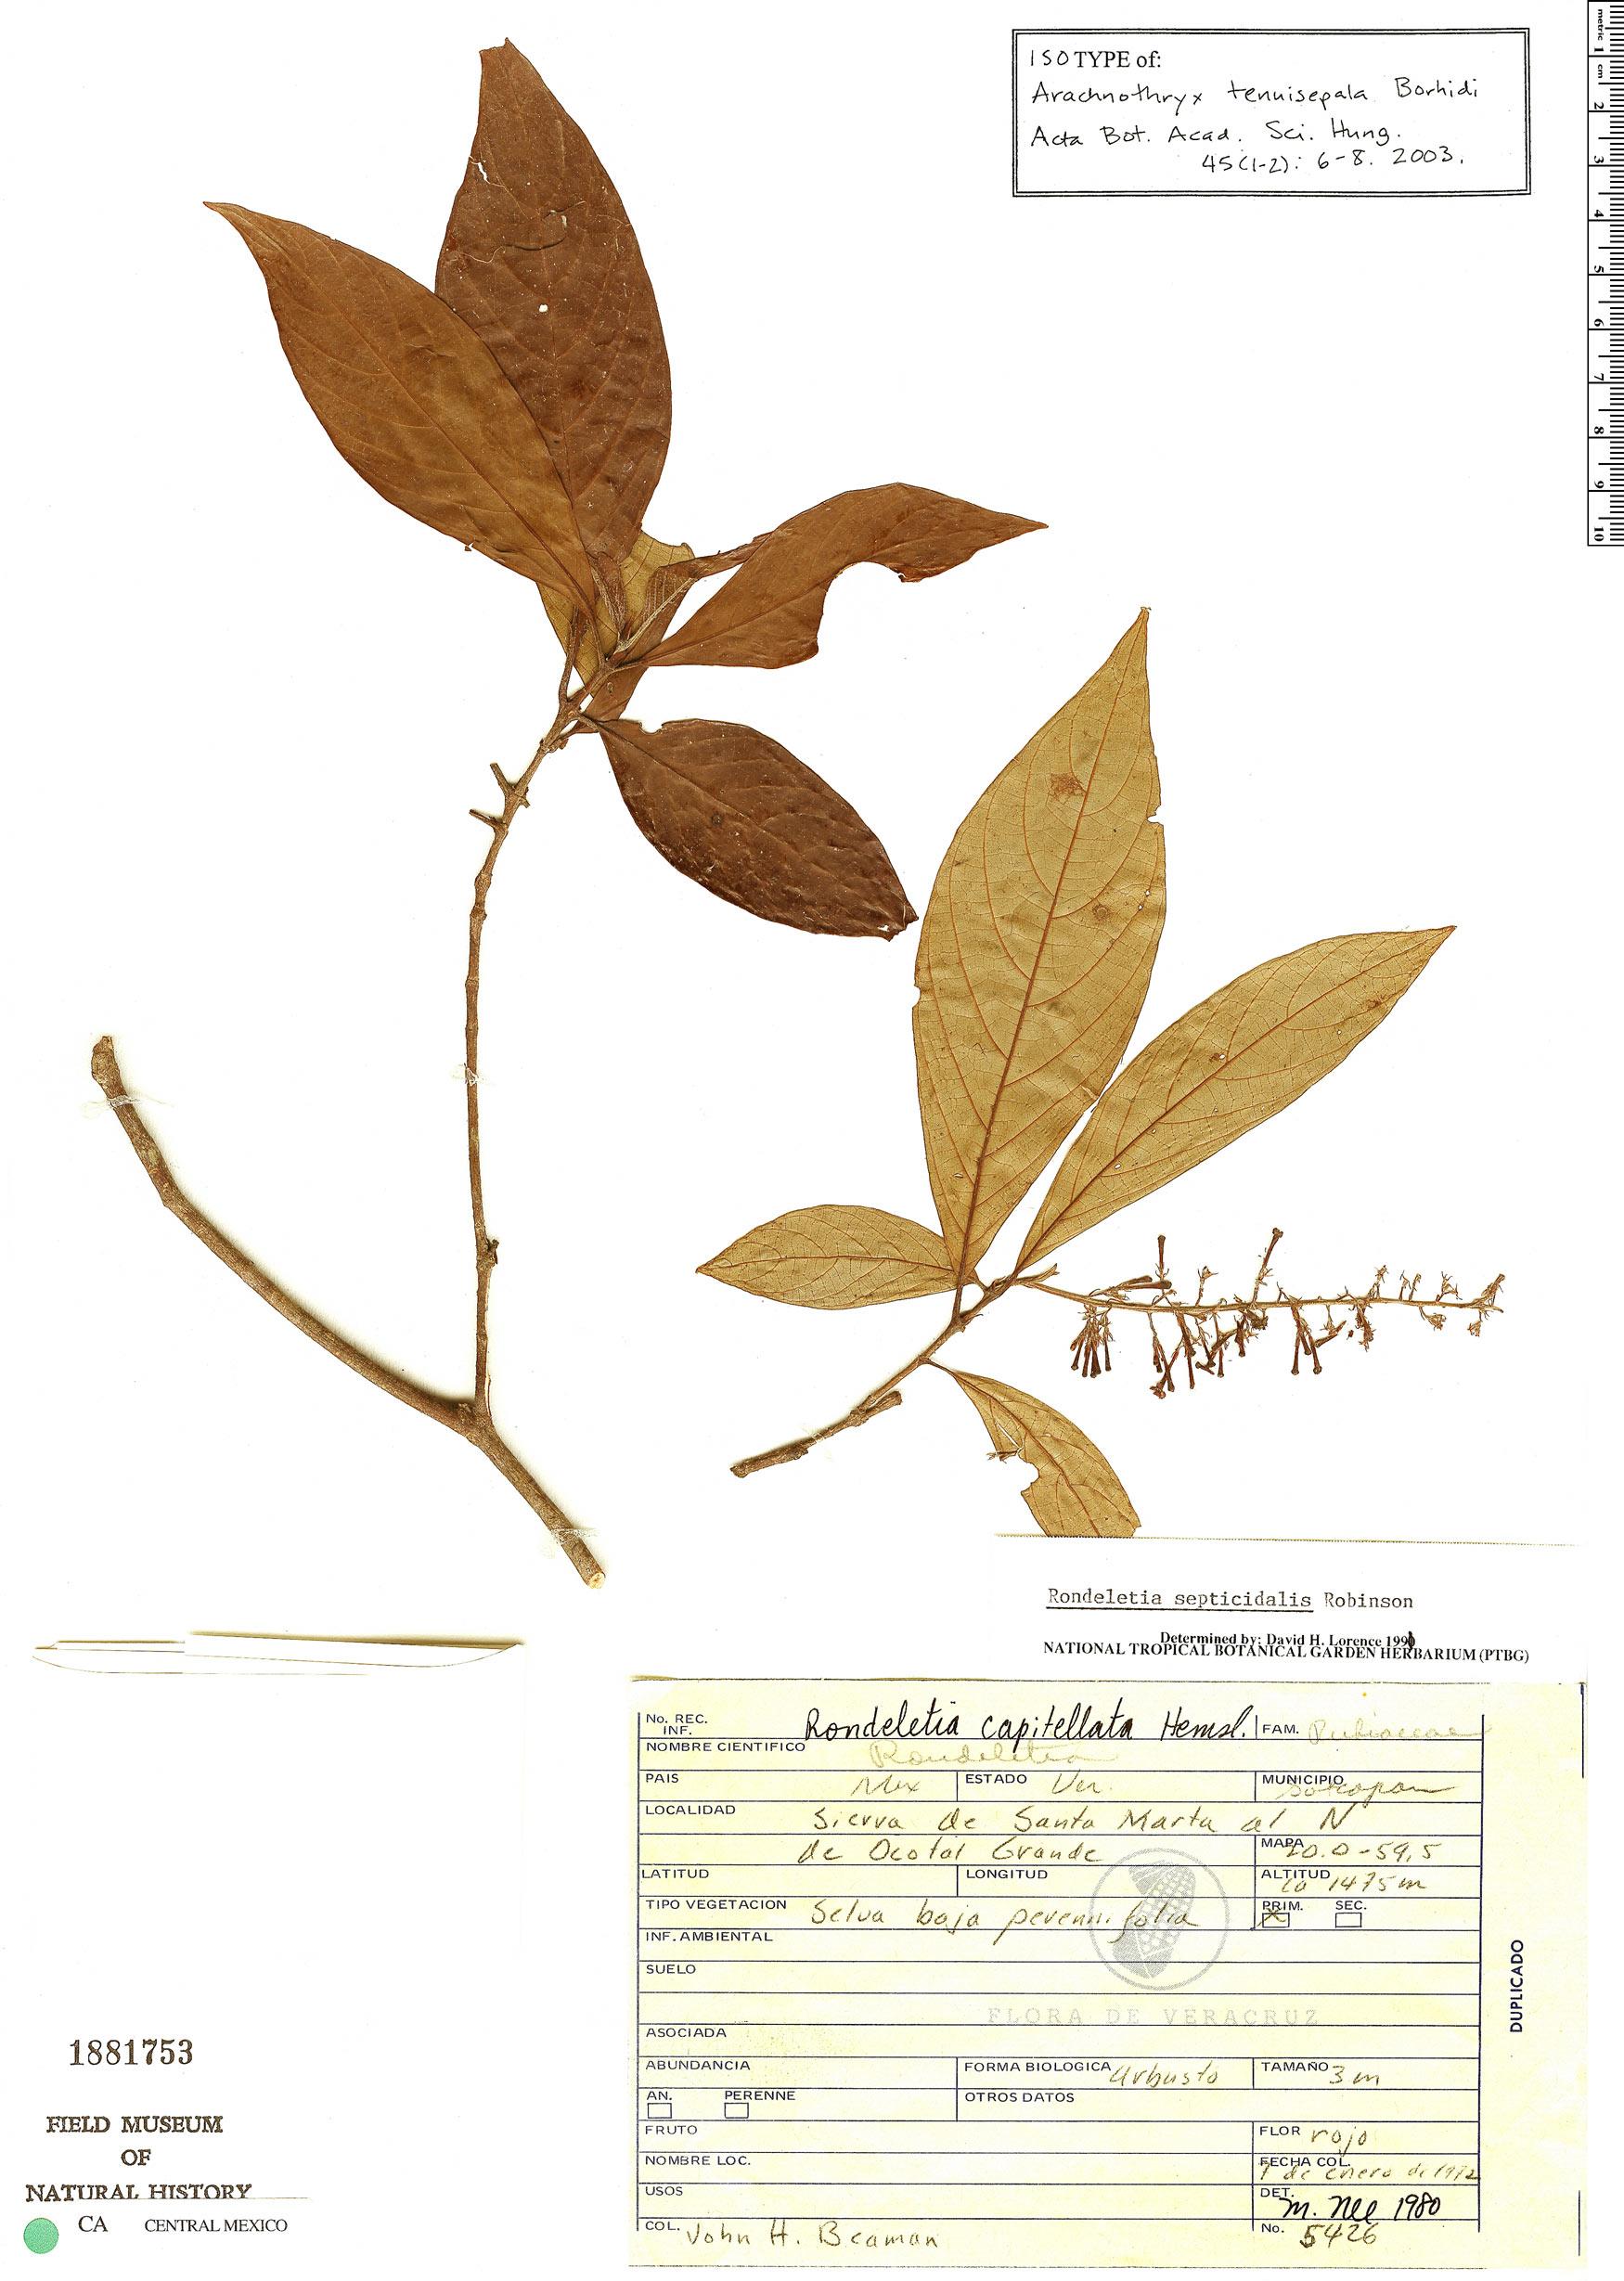 Specimen: Arachnothryx tenuisepala